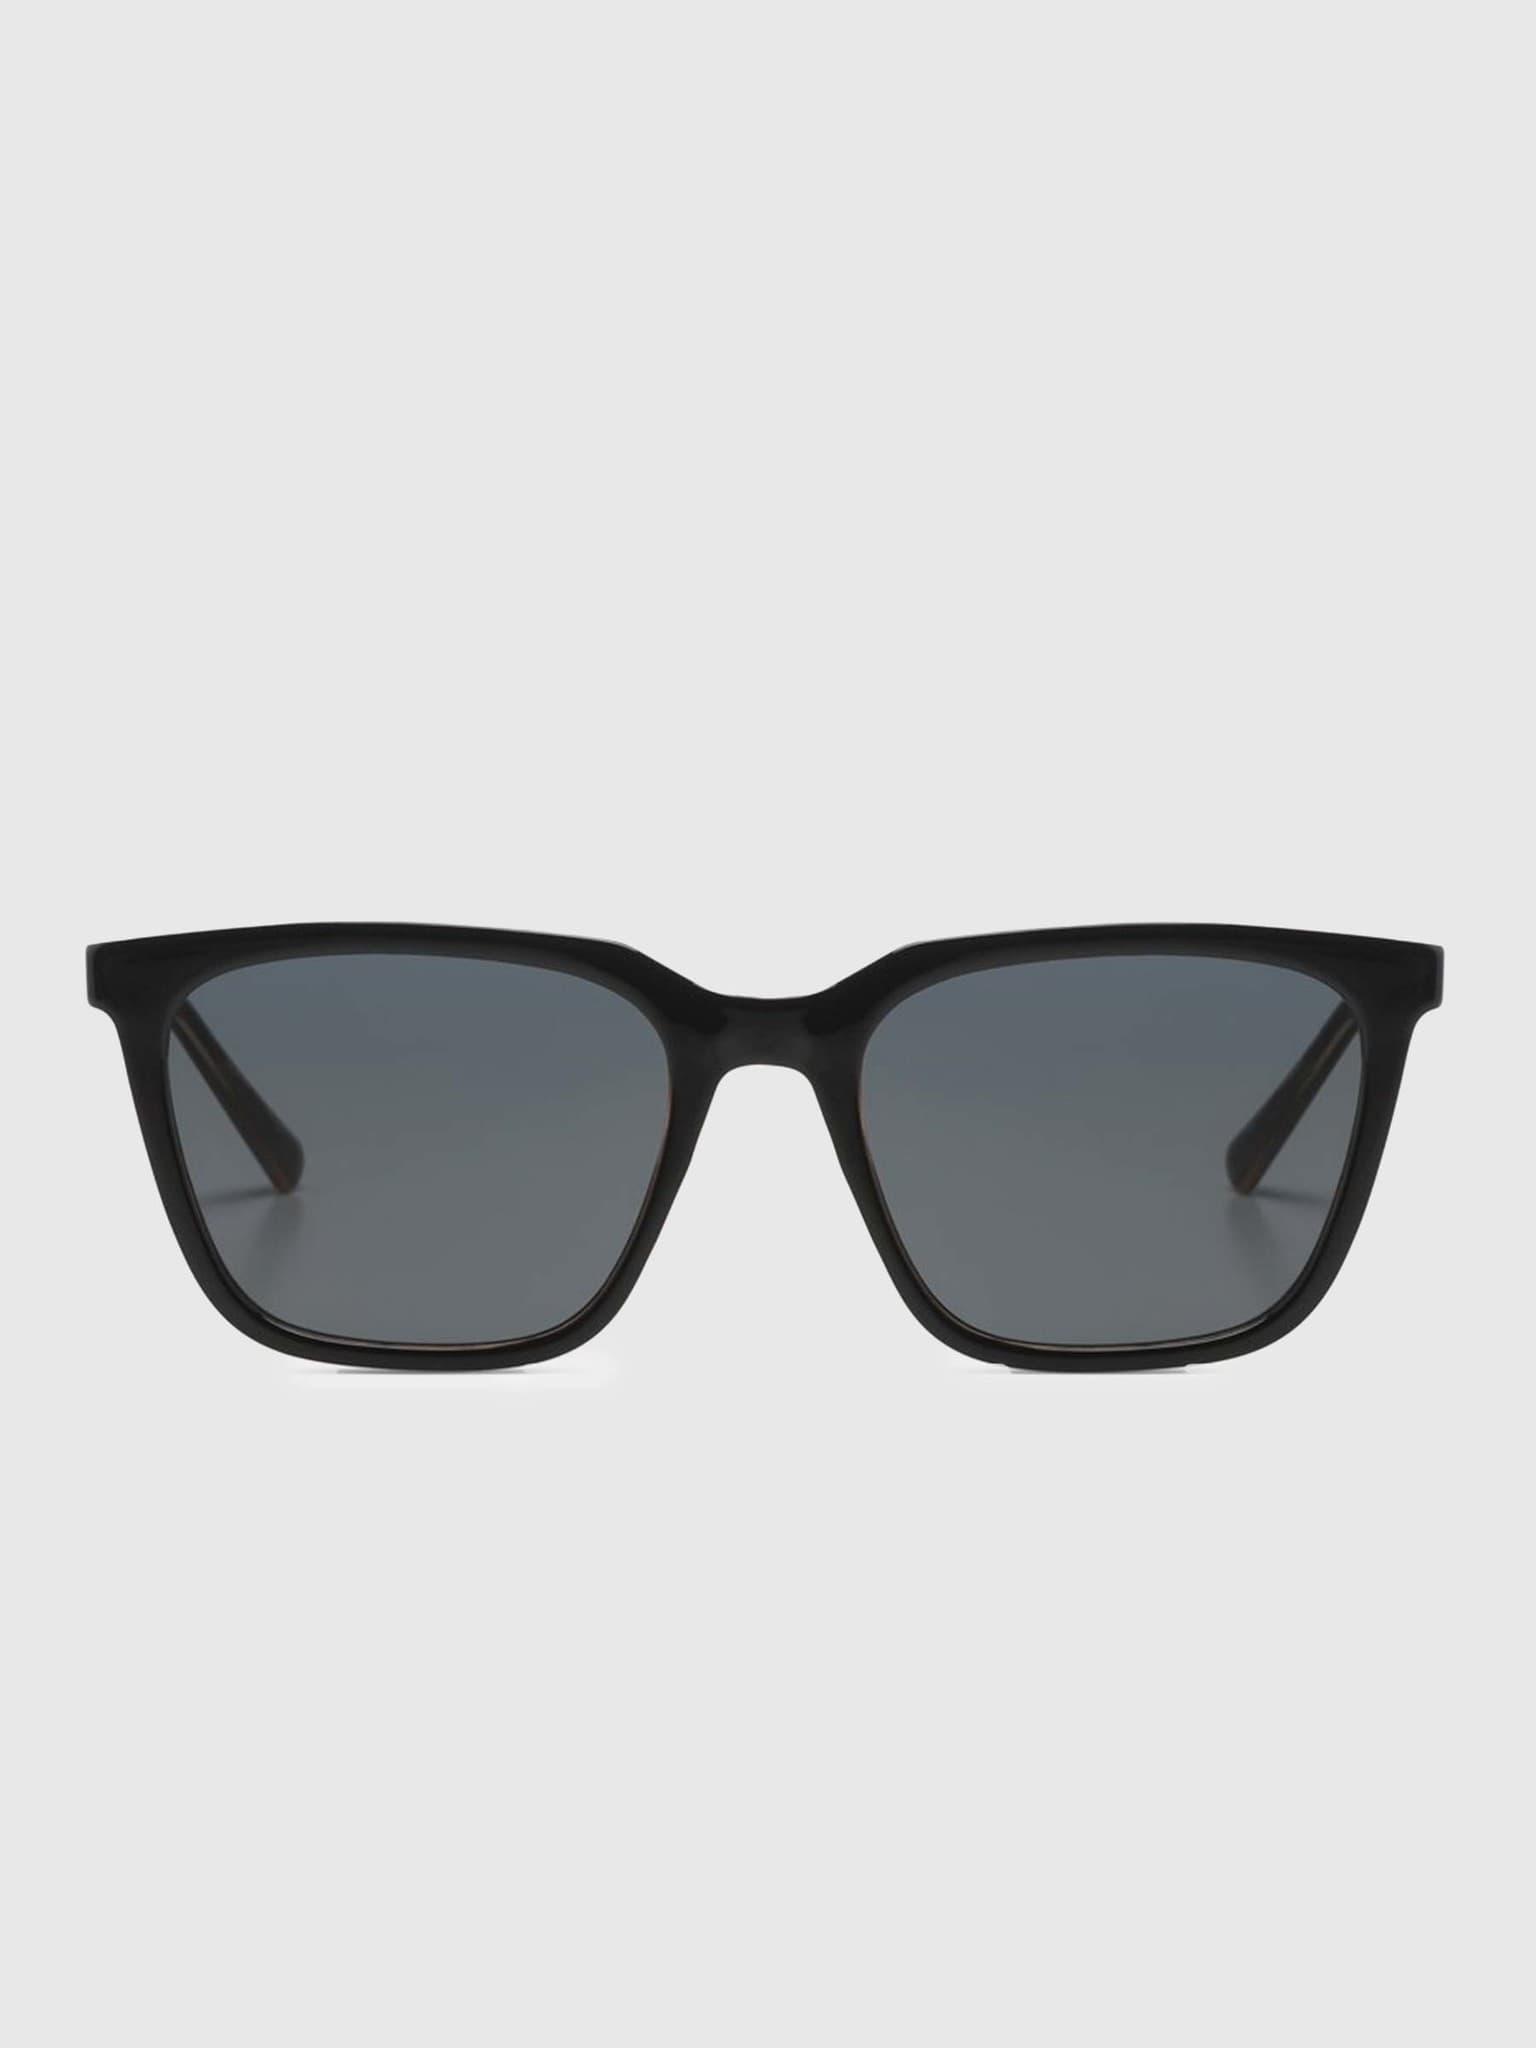 Jay Black Tortoise KOM-S6750